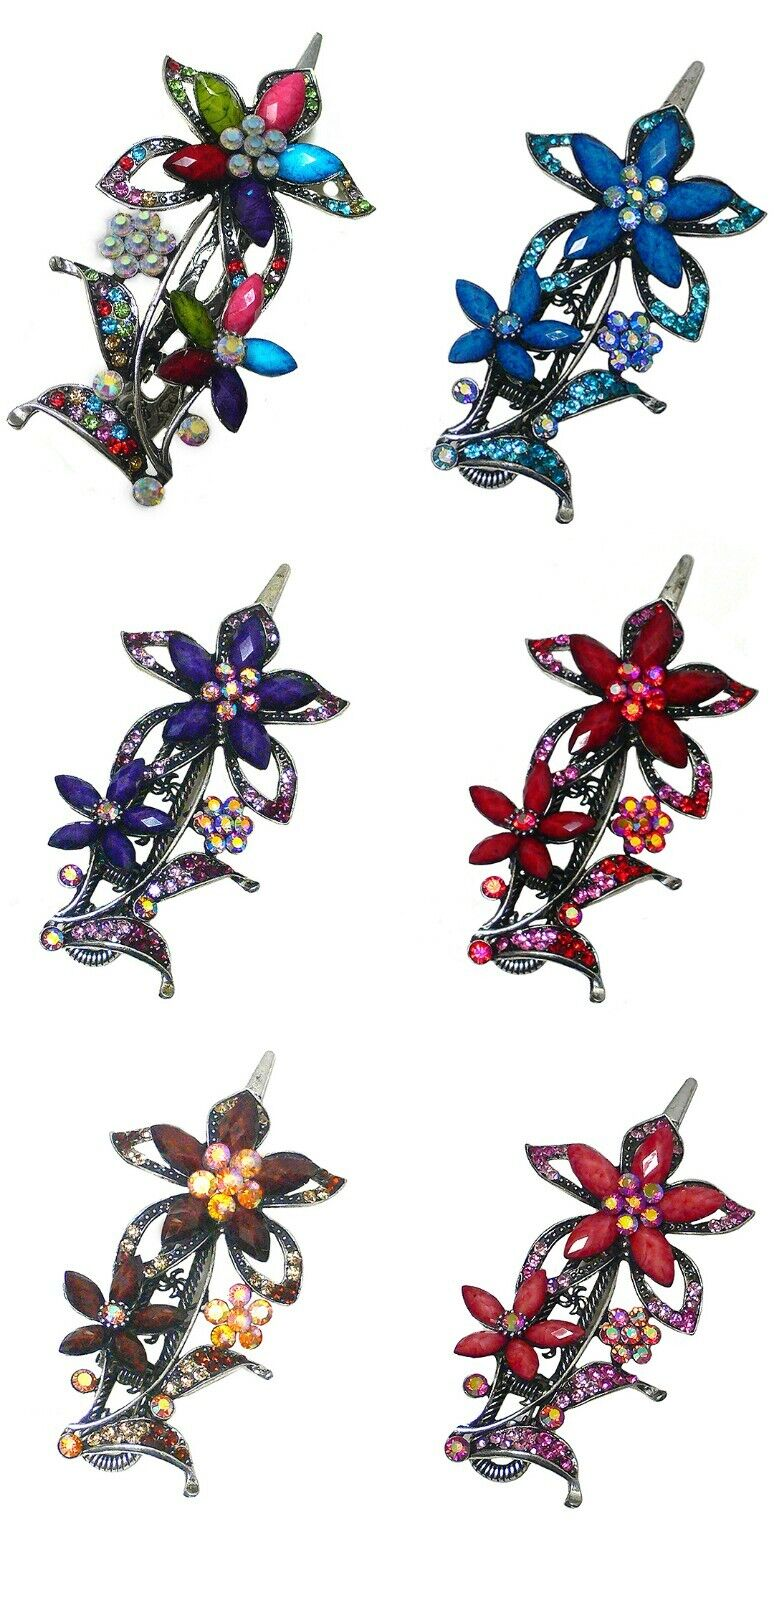 Bella Hair Clip w. Flower Ornament Sparkled Rhinestones/Bead